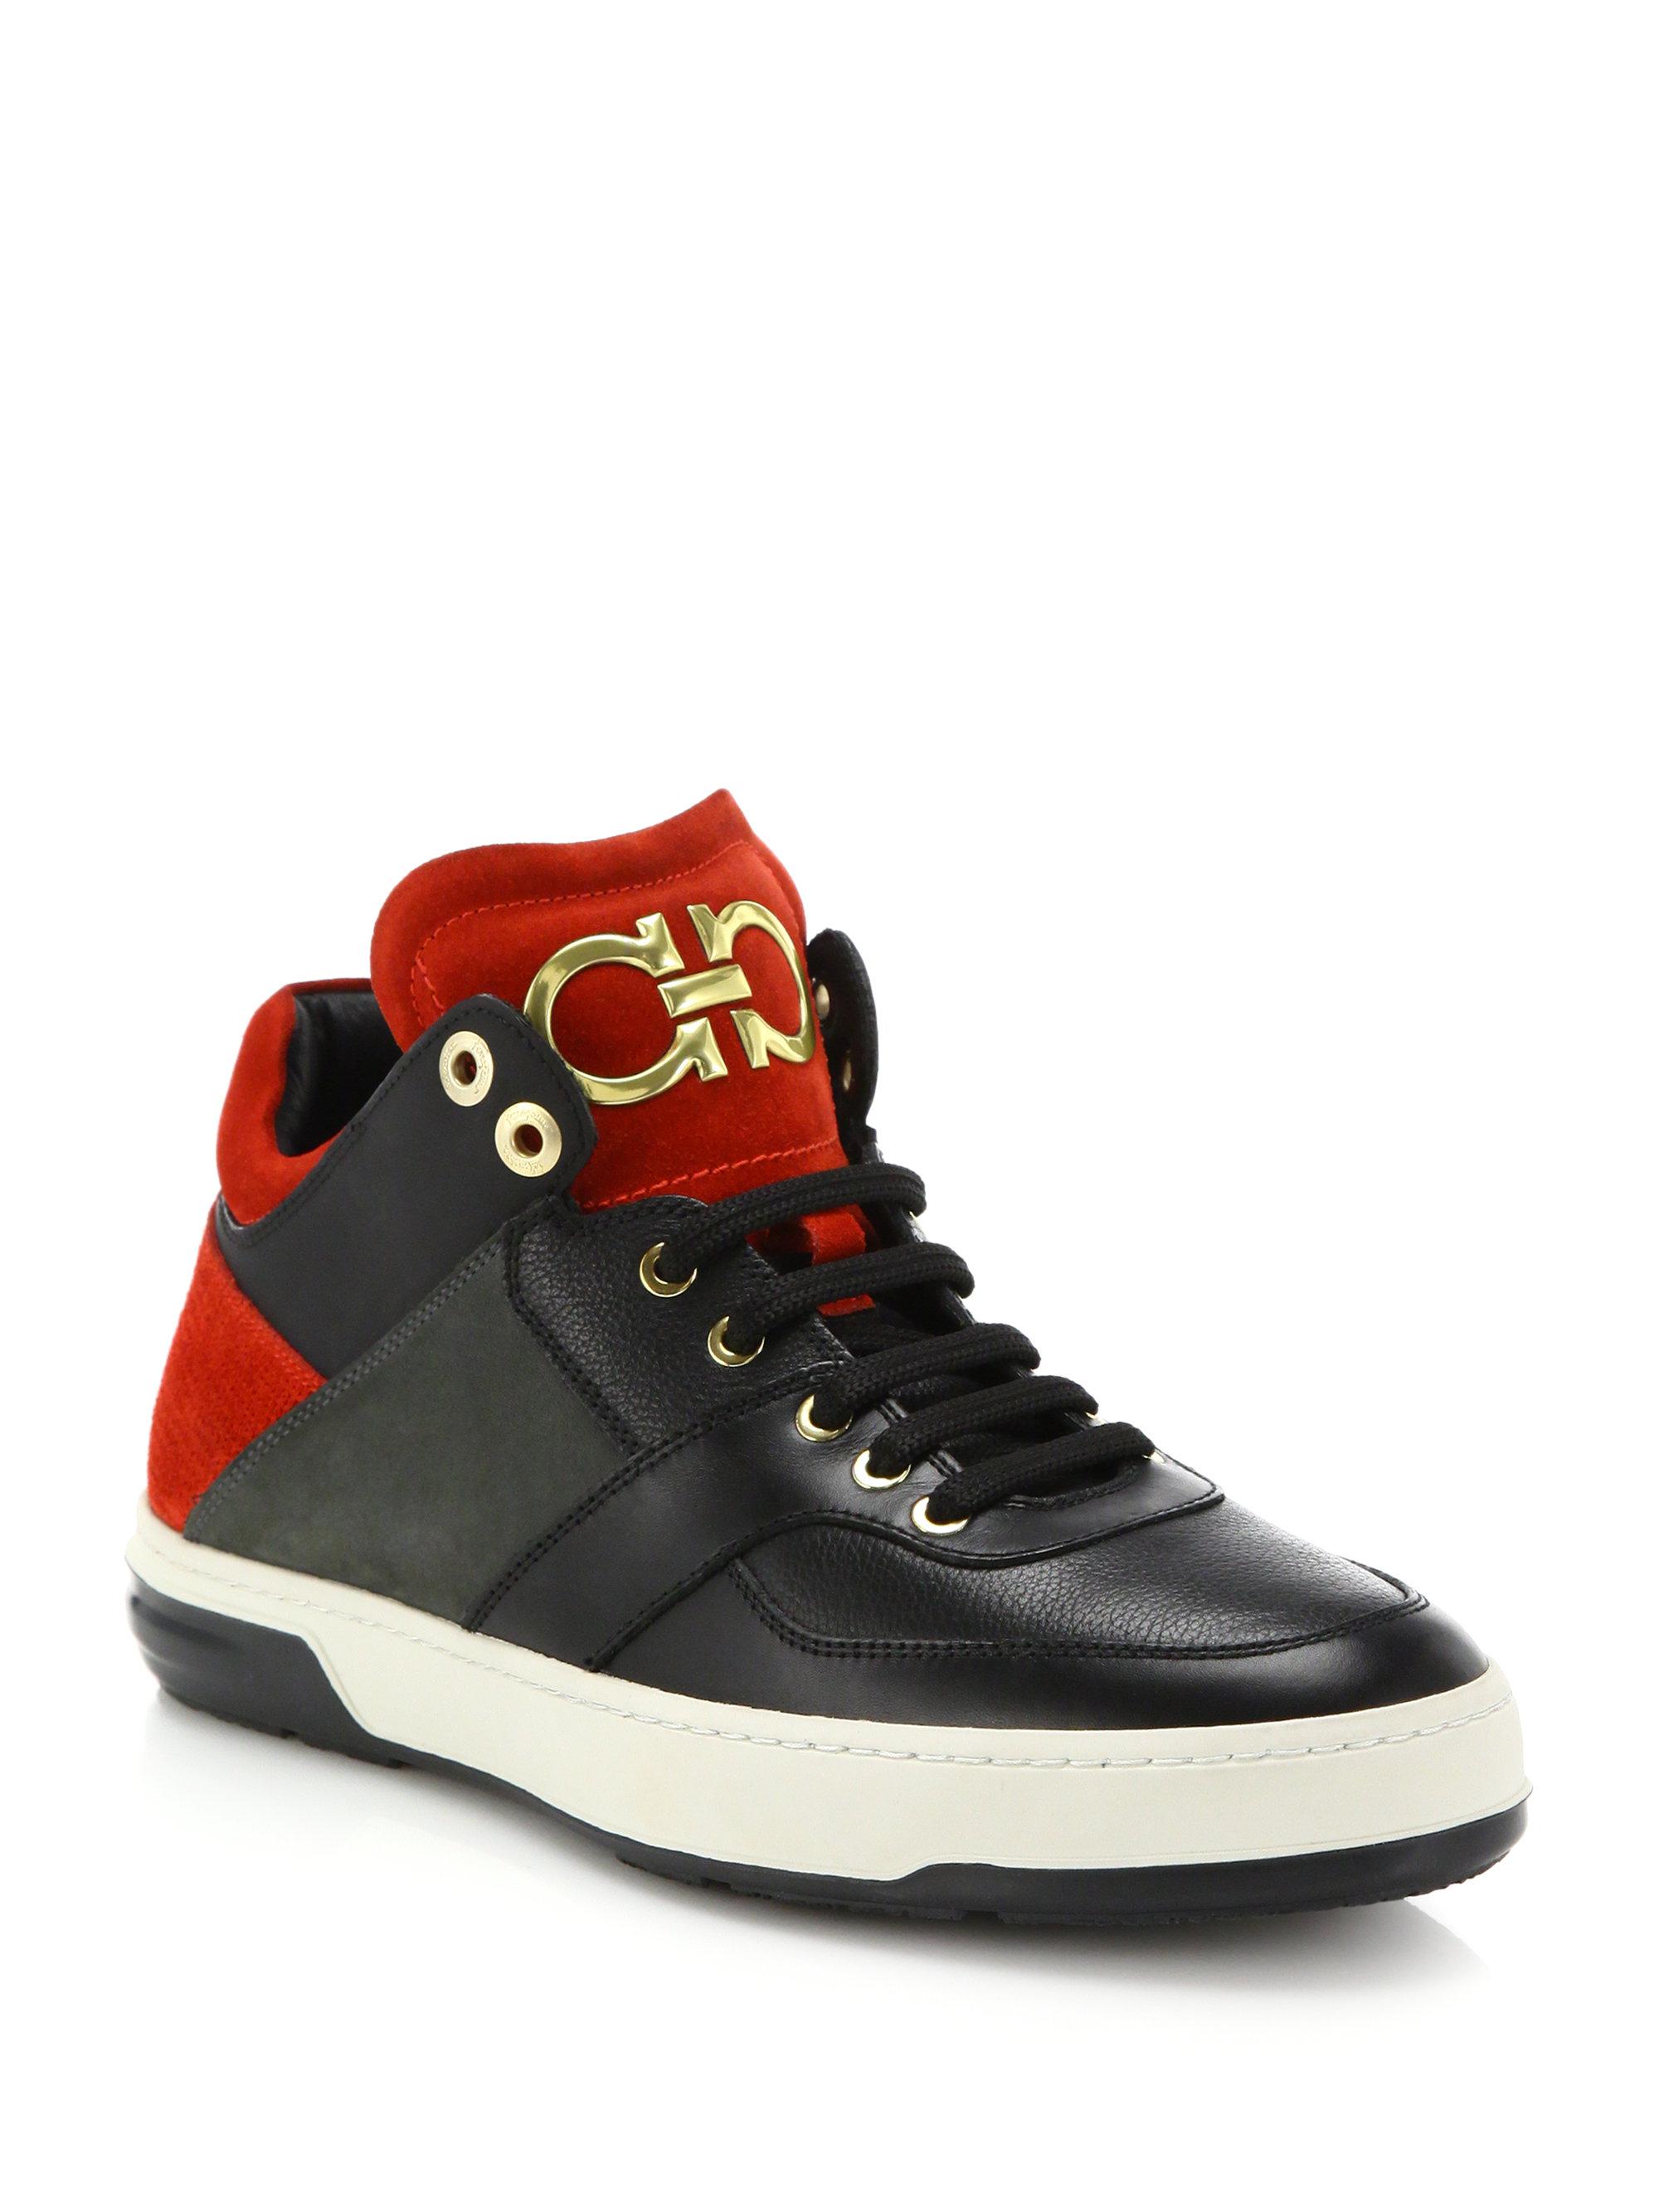 Ferragamo Monroe Chaussures De Sport - Noir Co2O0LJ